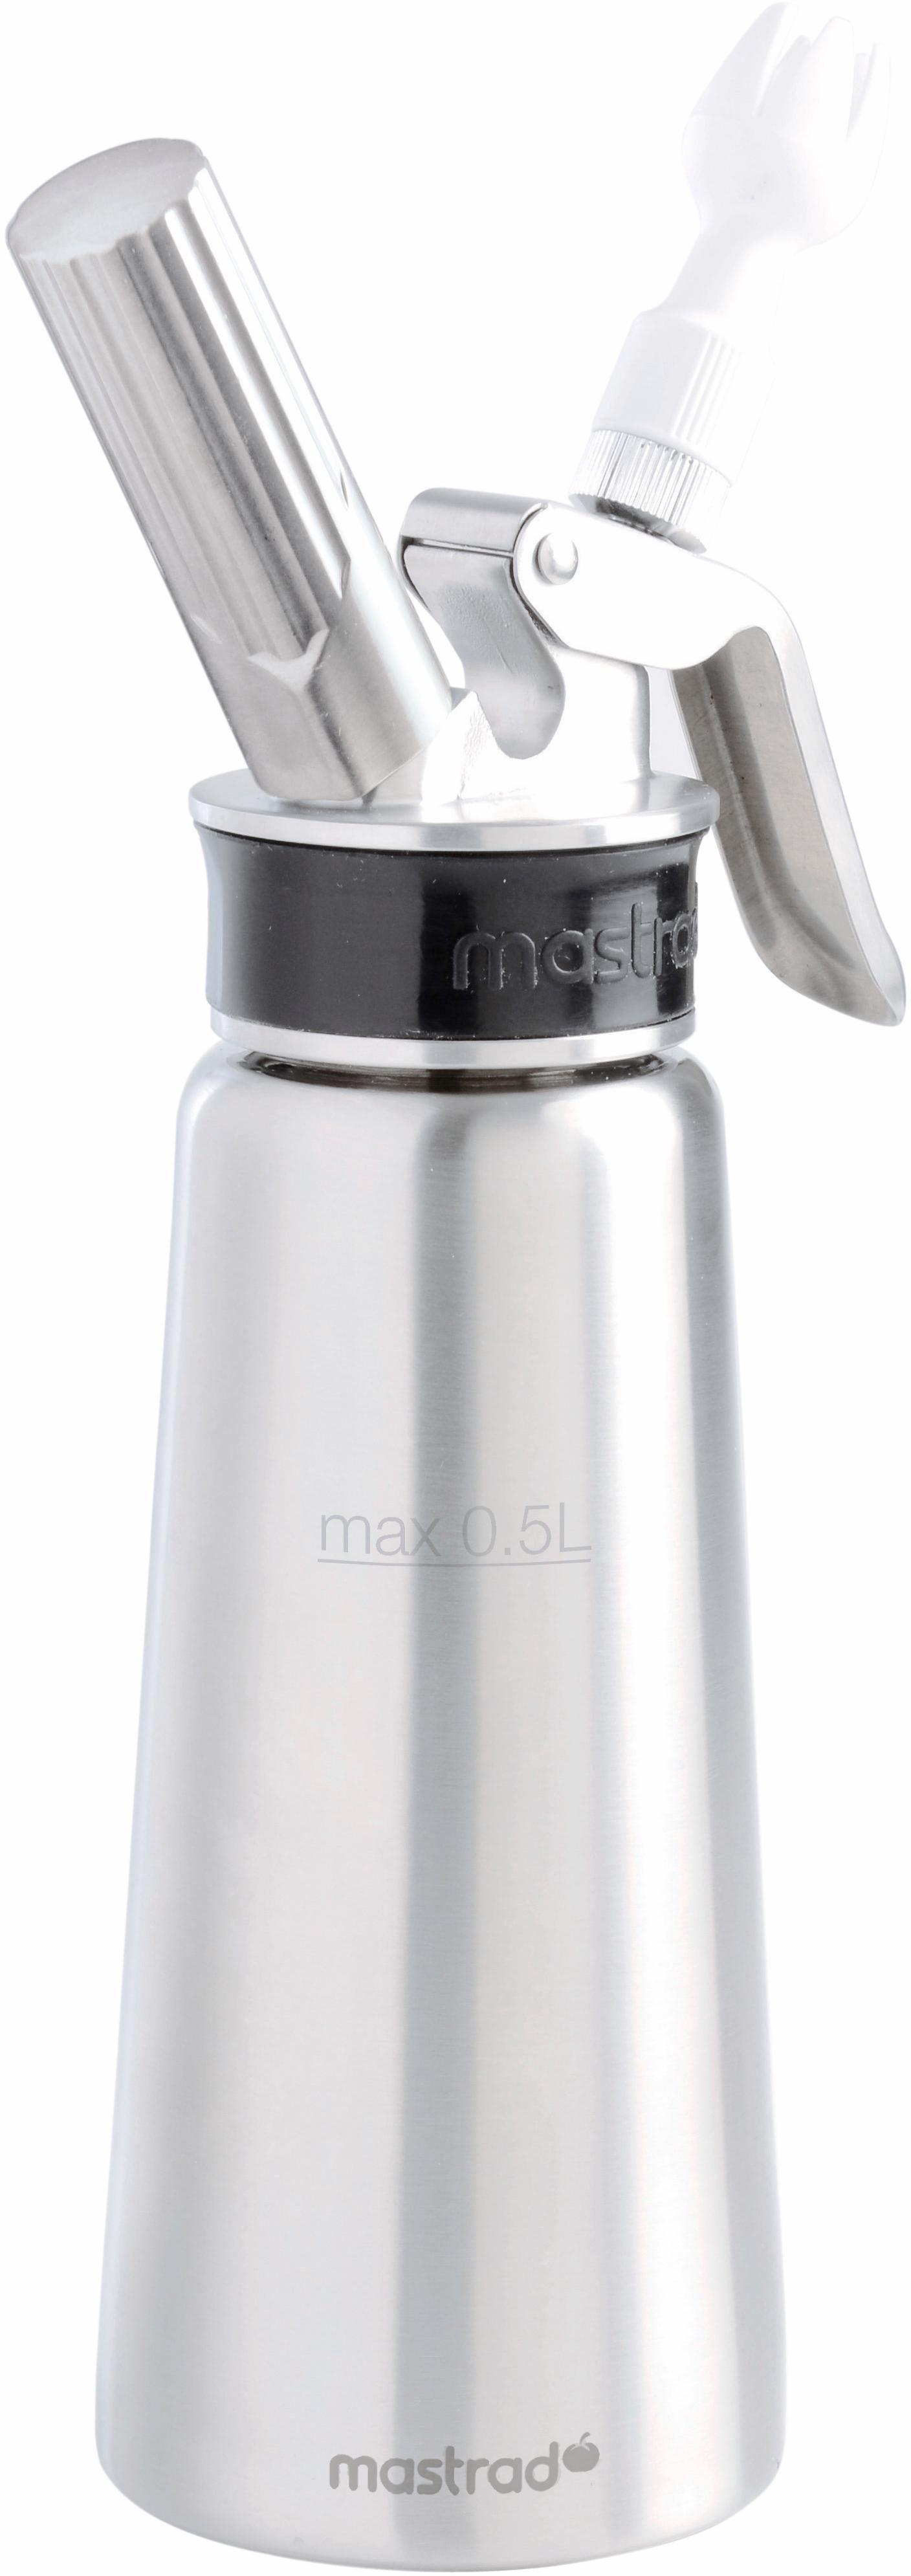 Mastrad Sahnespender, Edelstahl, 0,5 Liter